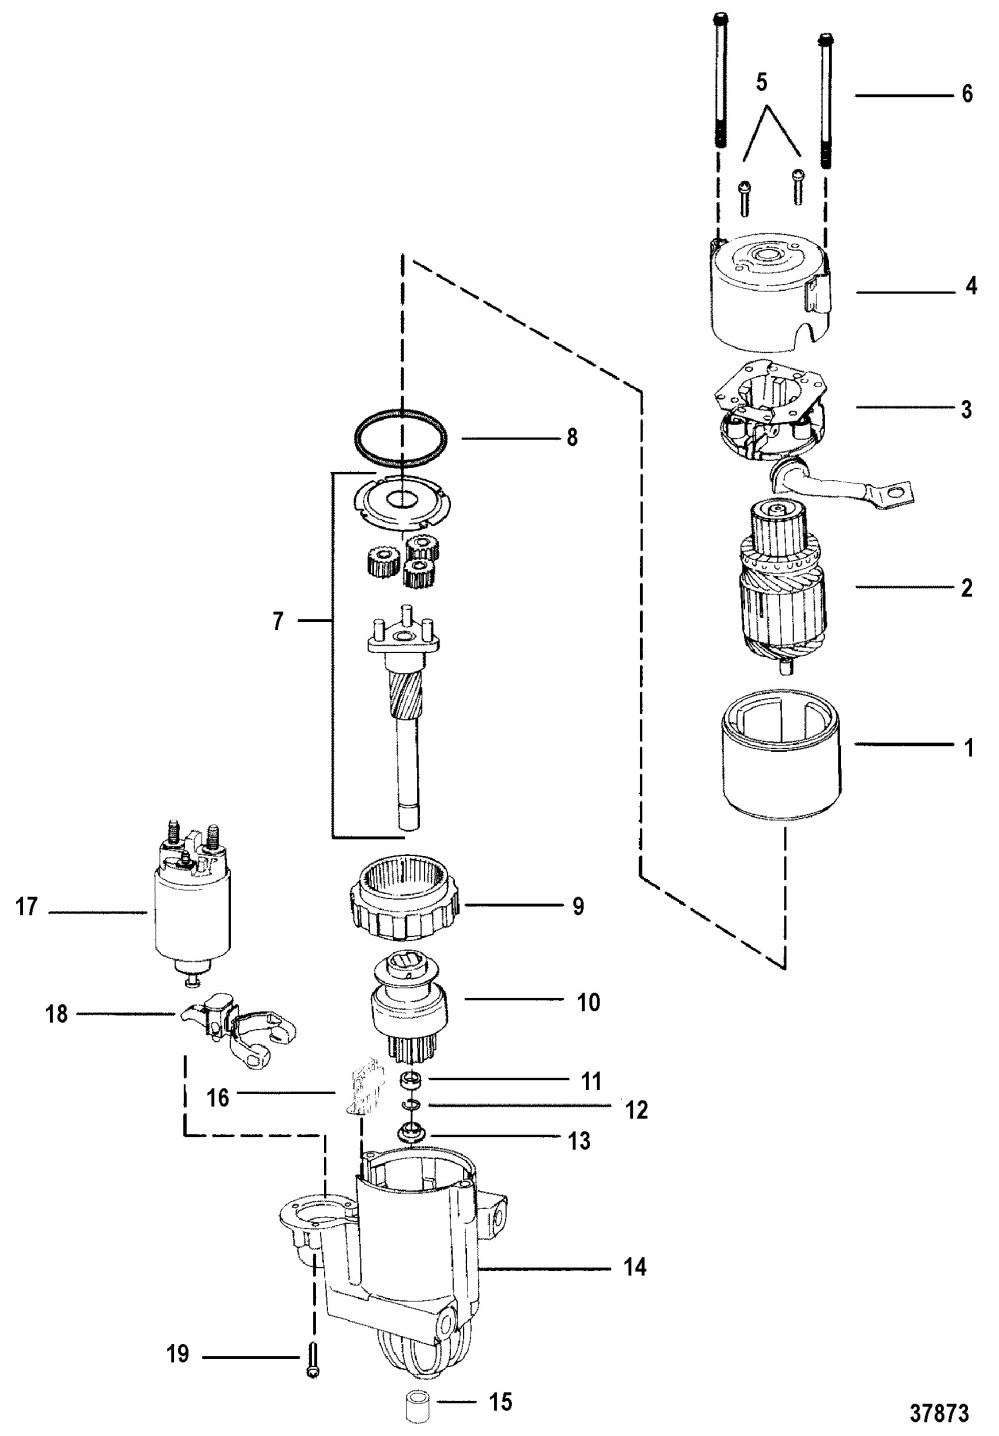 medium resolution of 3 liter mercruiser engine diagram starter motor for mercruiser 7 4l bravo i ii iii engine